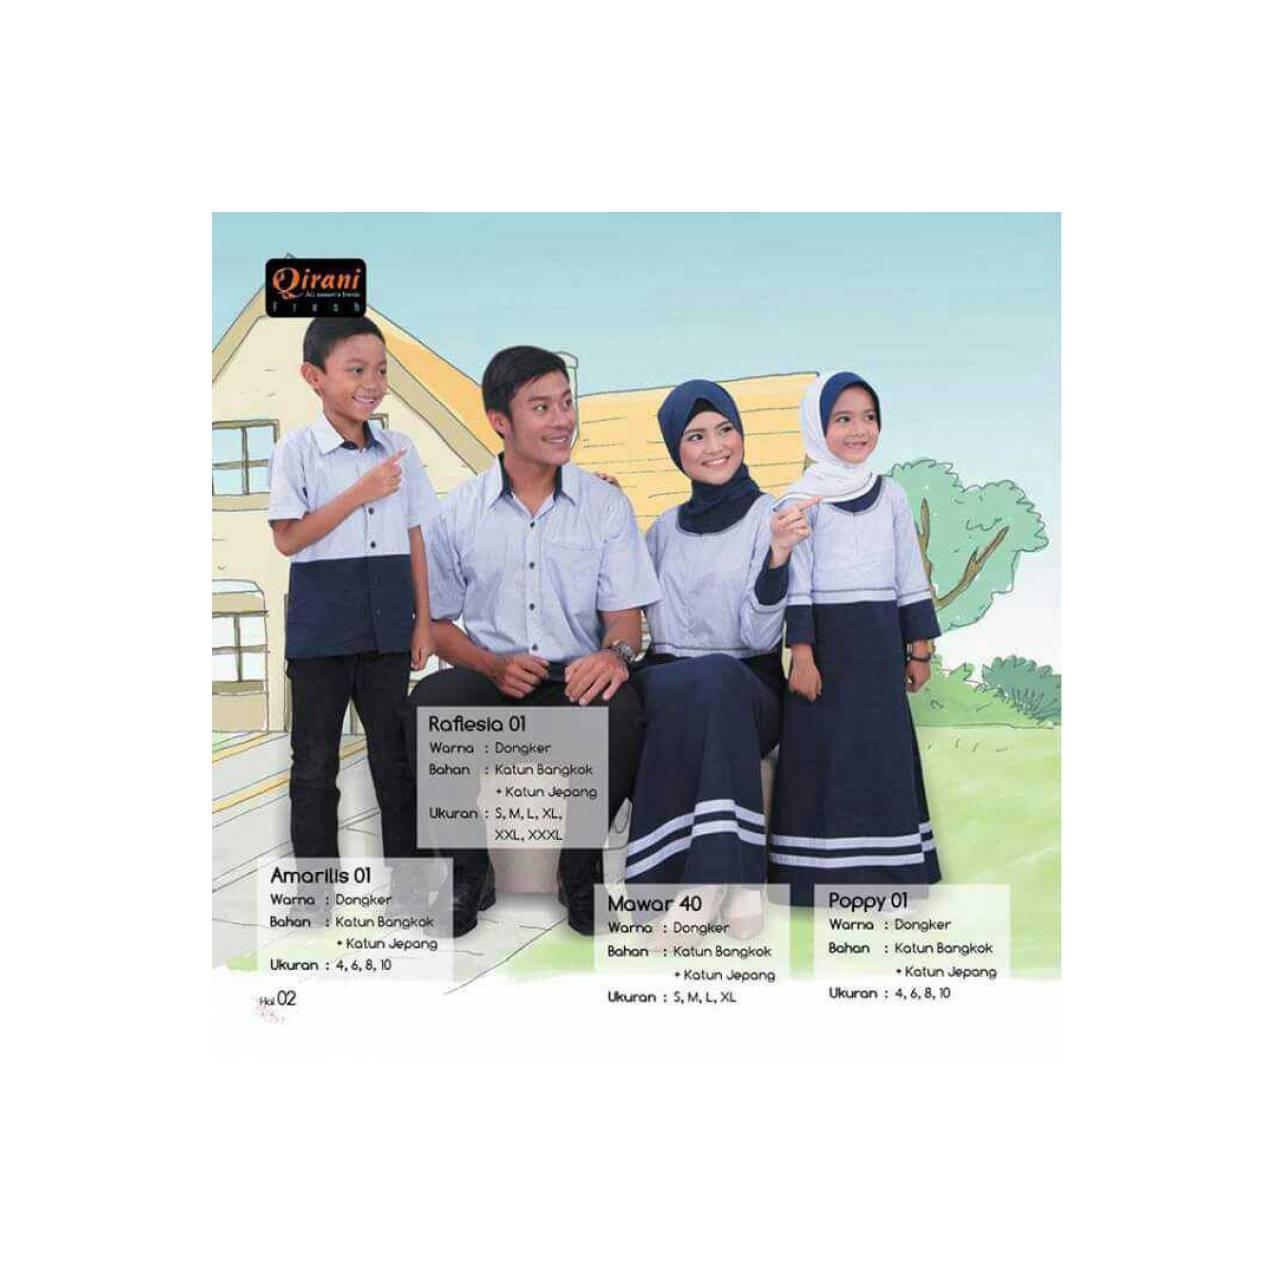 Terbaru - Qirani Sarimbit - Gamis Kemeja Katun Dongker/Busana Keluarga